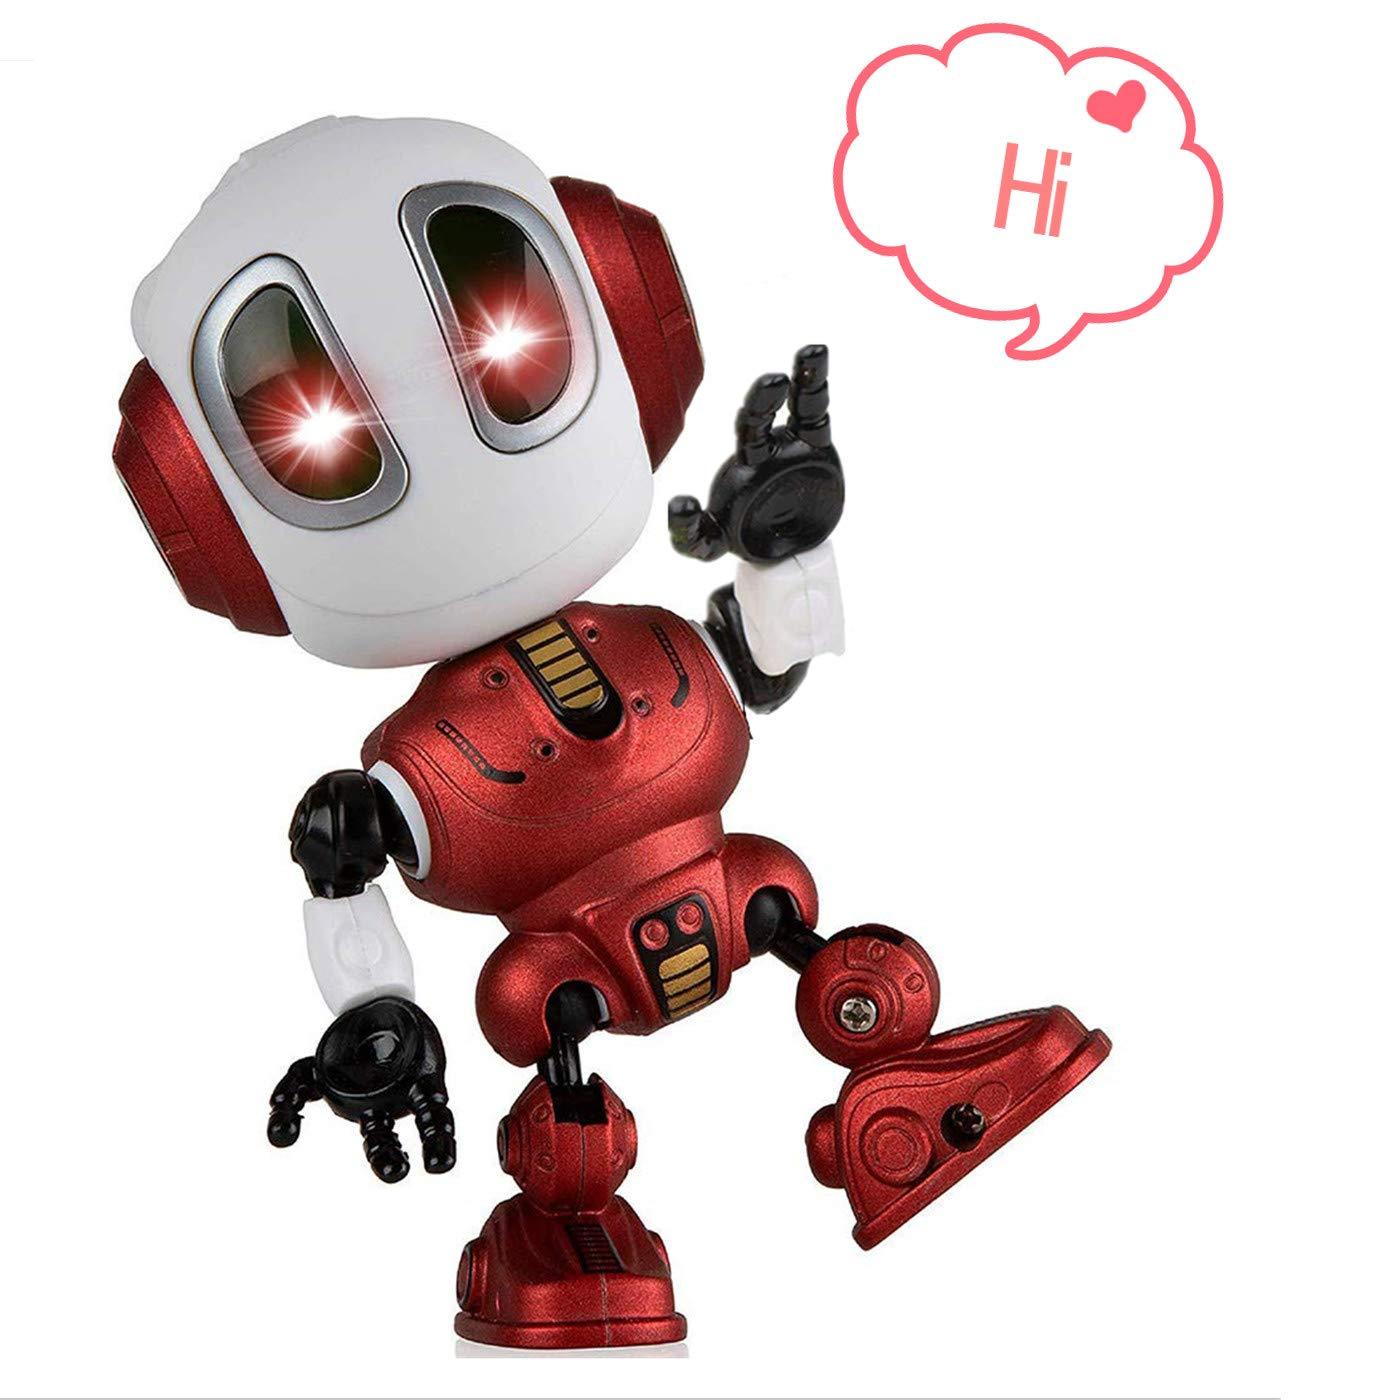 ALLCELE Fun Recording Talking Robot for Boys little Kids toys